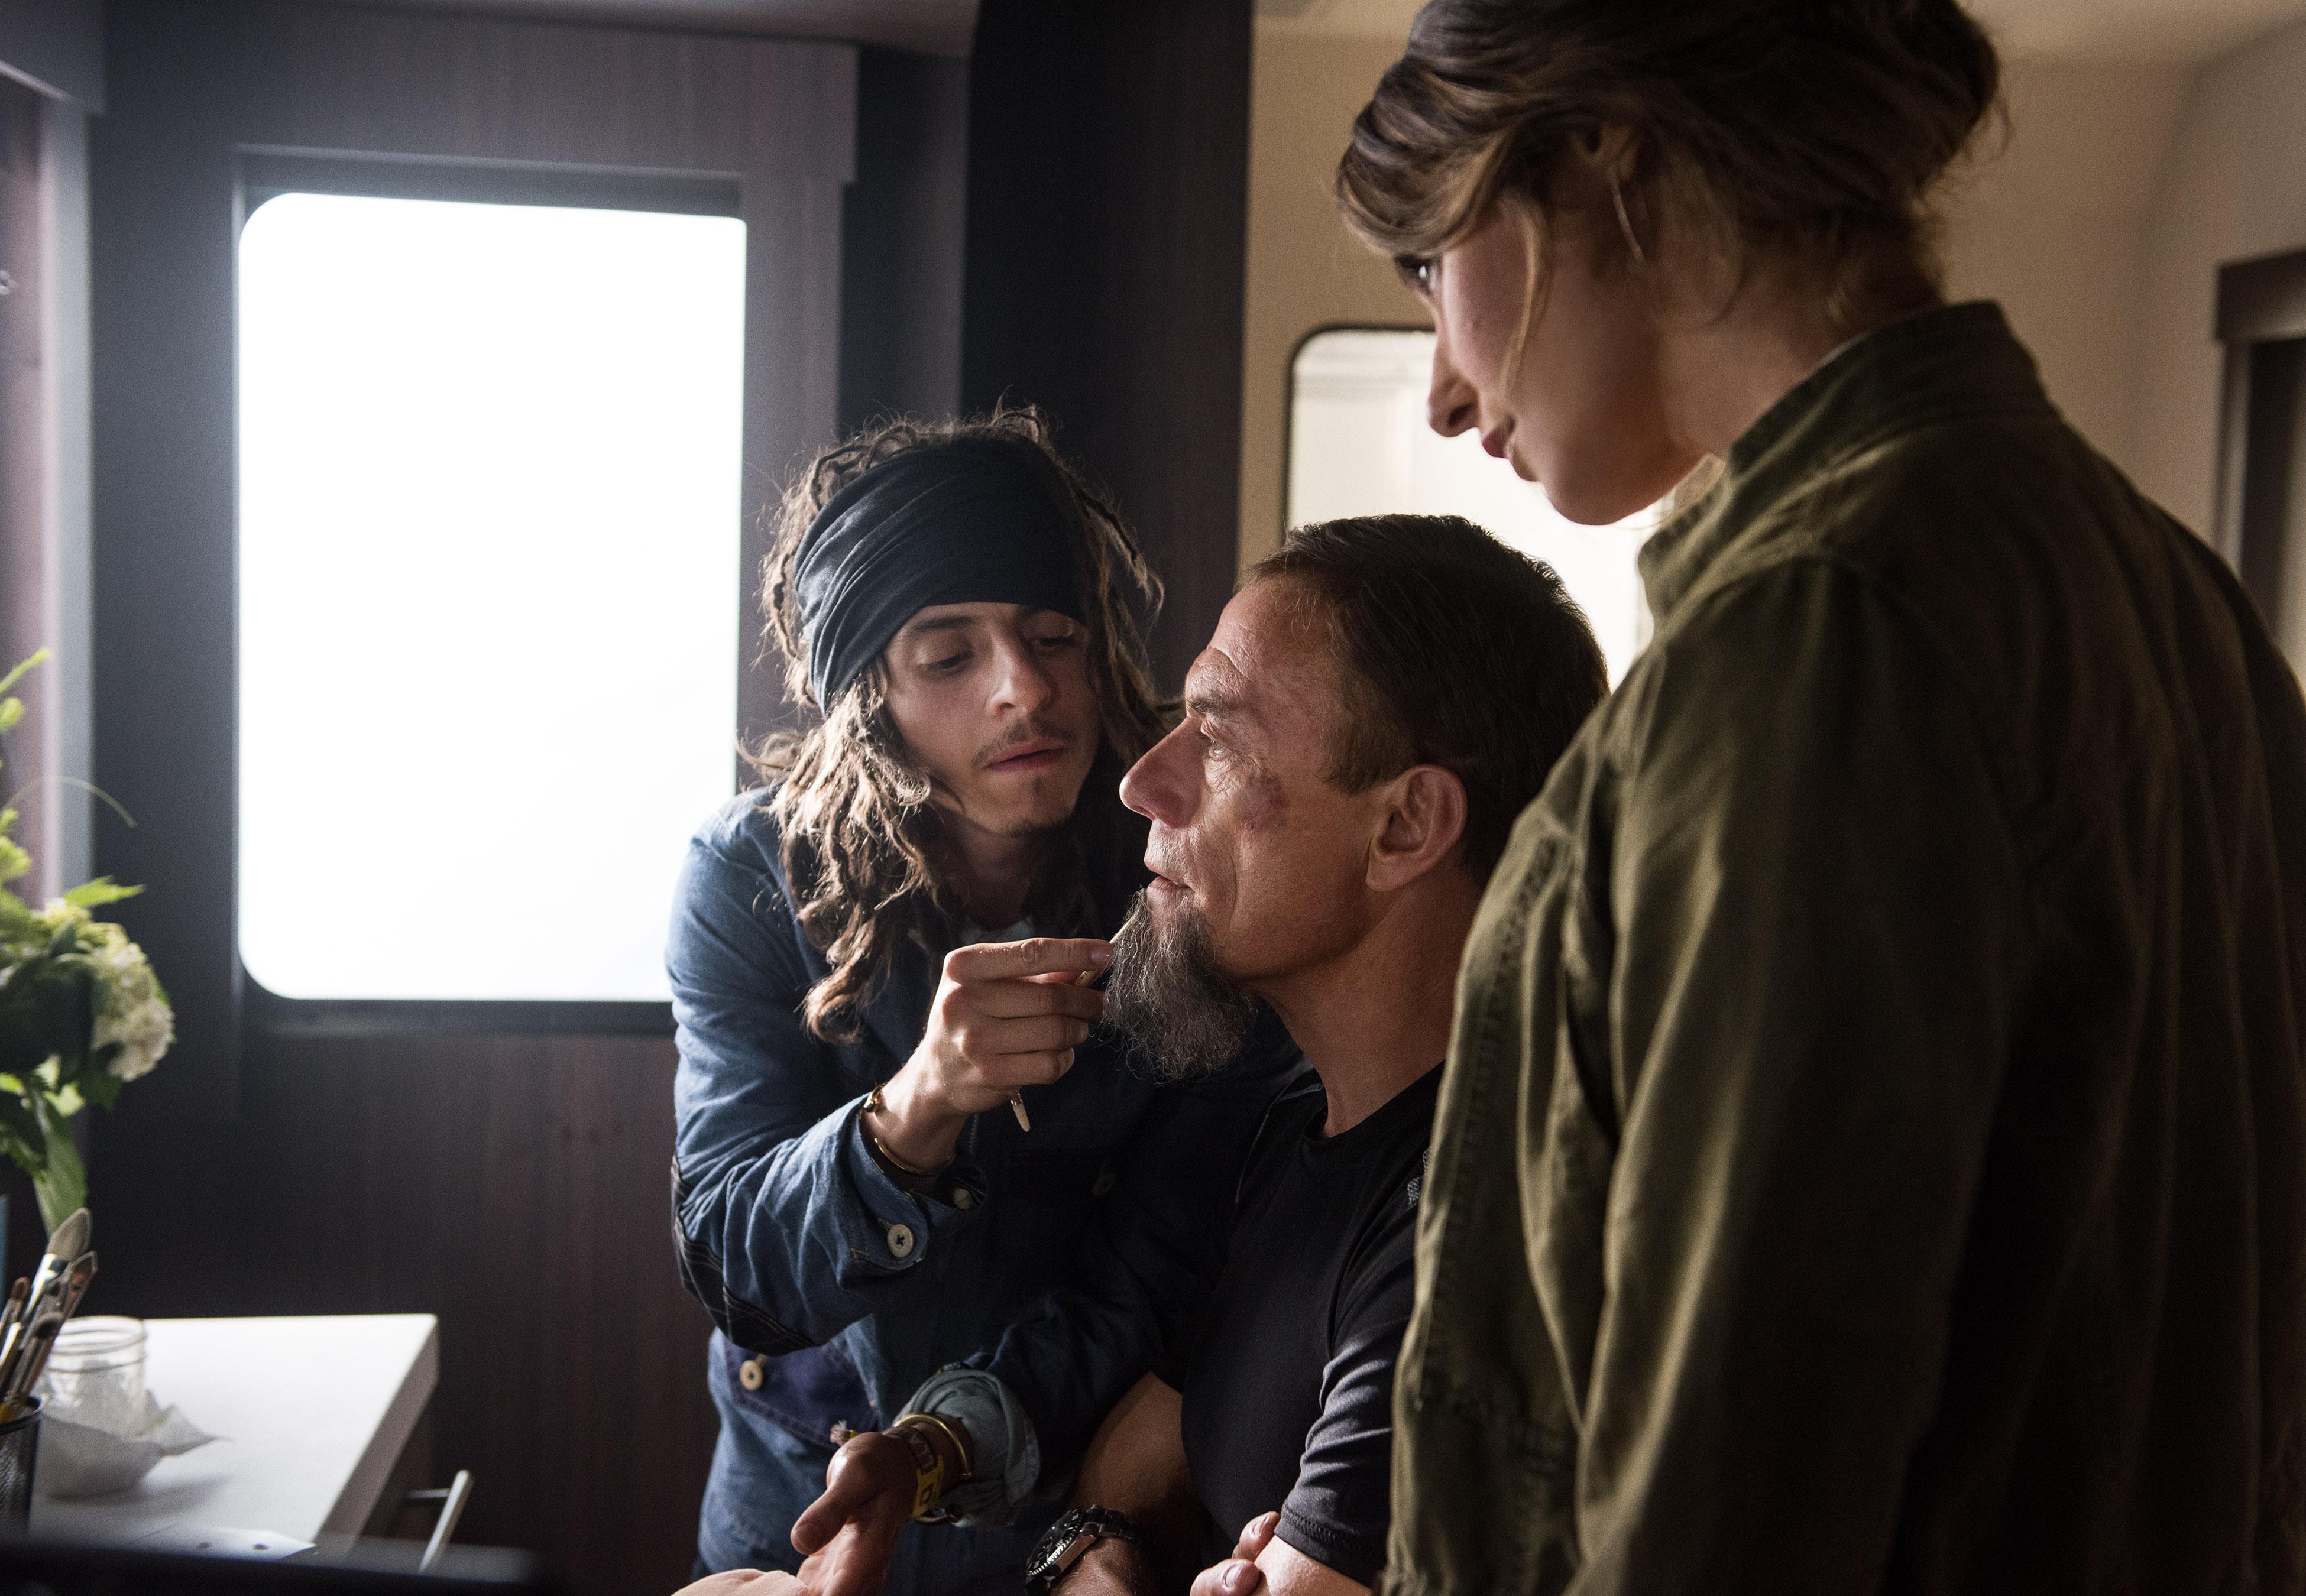 Jean-Claude Van Damme, Kat Foster, and Moises Arias in Pilot (2016)